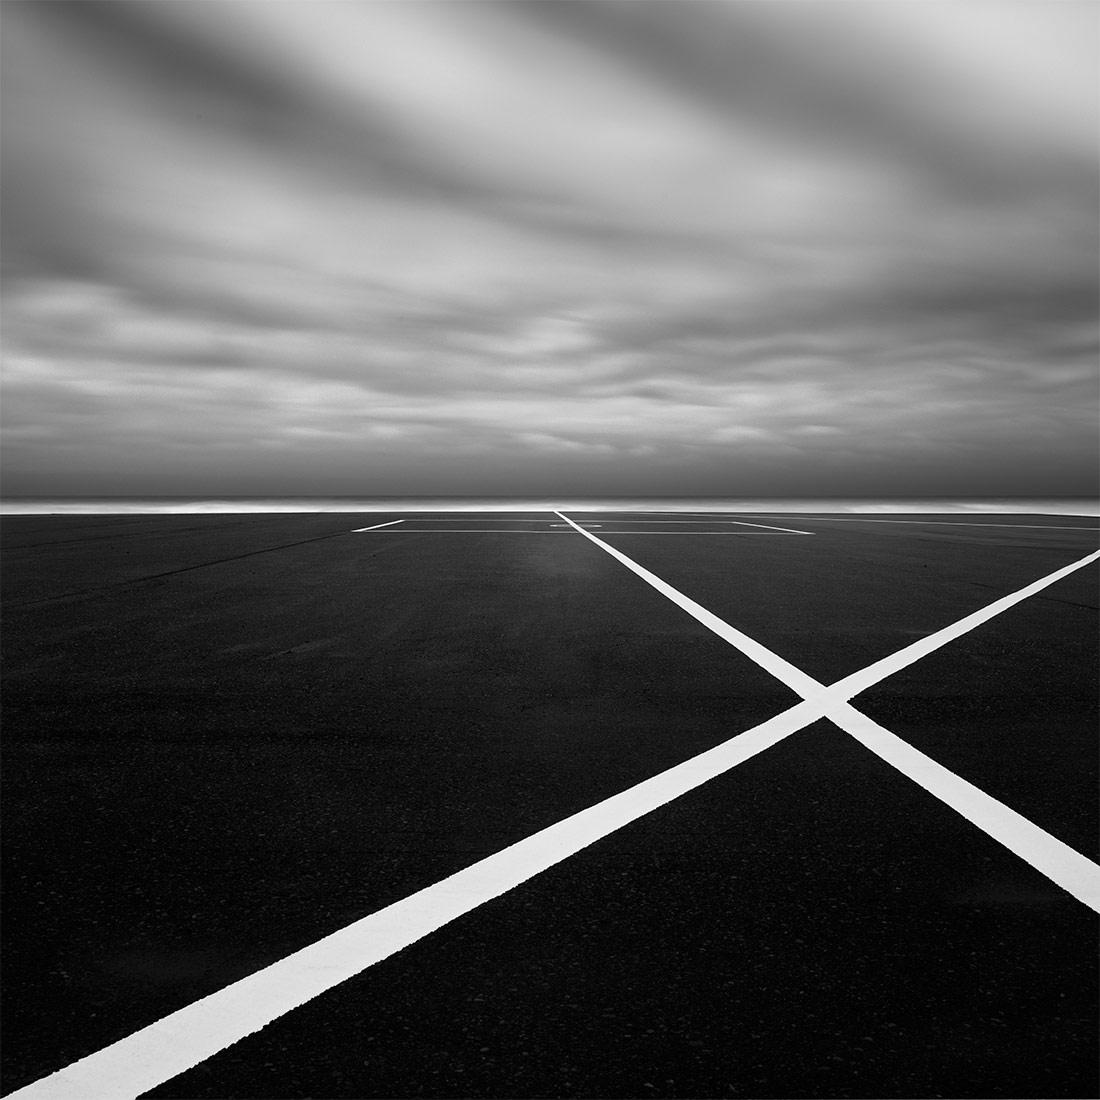 Ритм, © Хиронори Накамура, 1-е место в категории «Абстракция», серия, Конкурс чёрно-белой фотографии MonoVisions